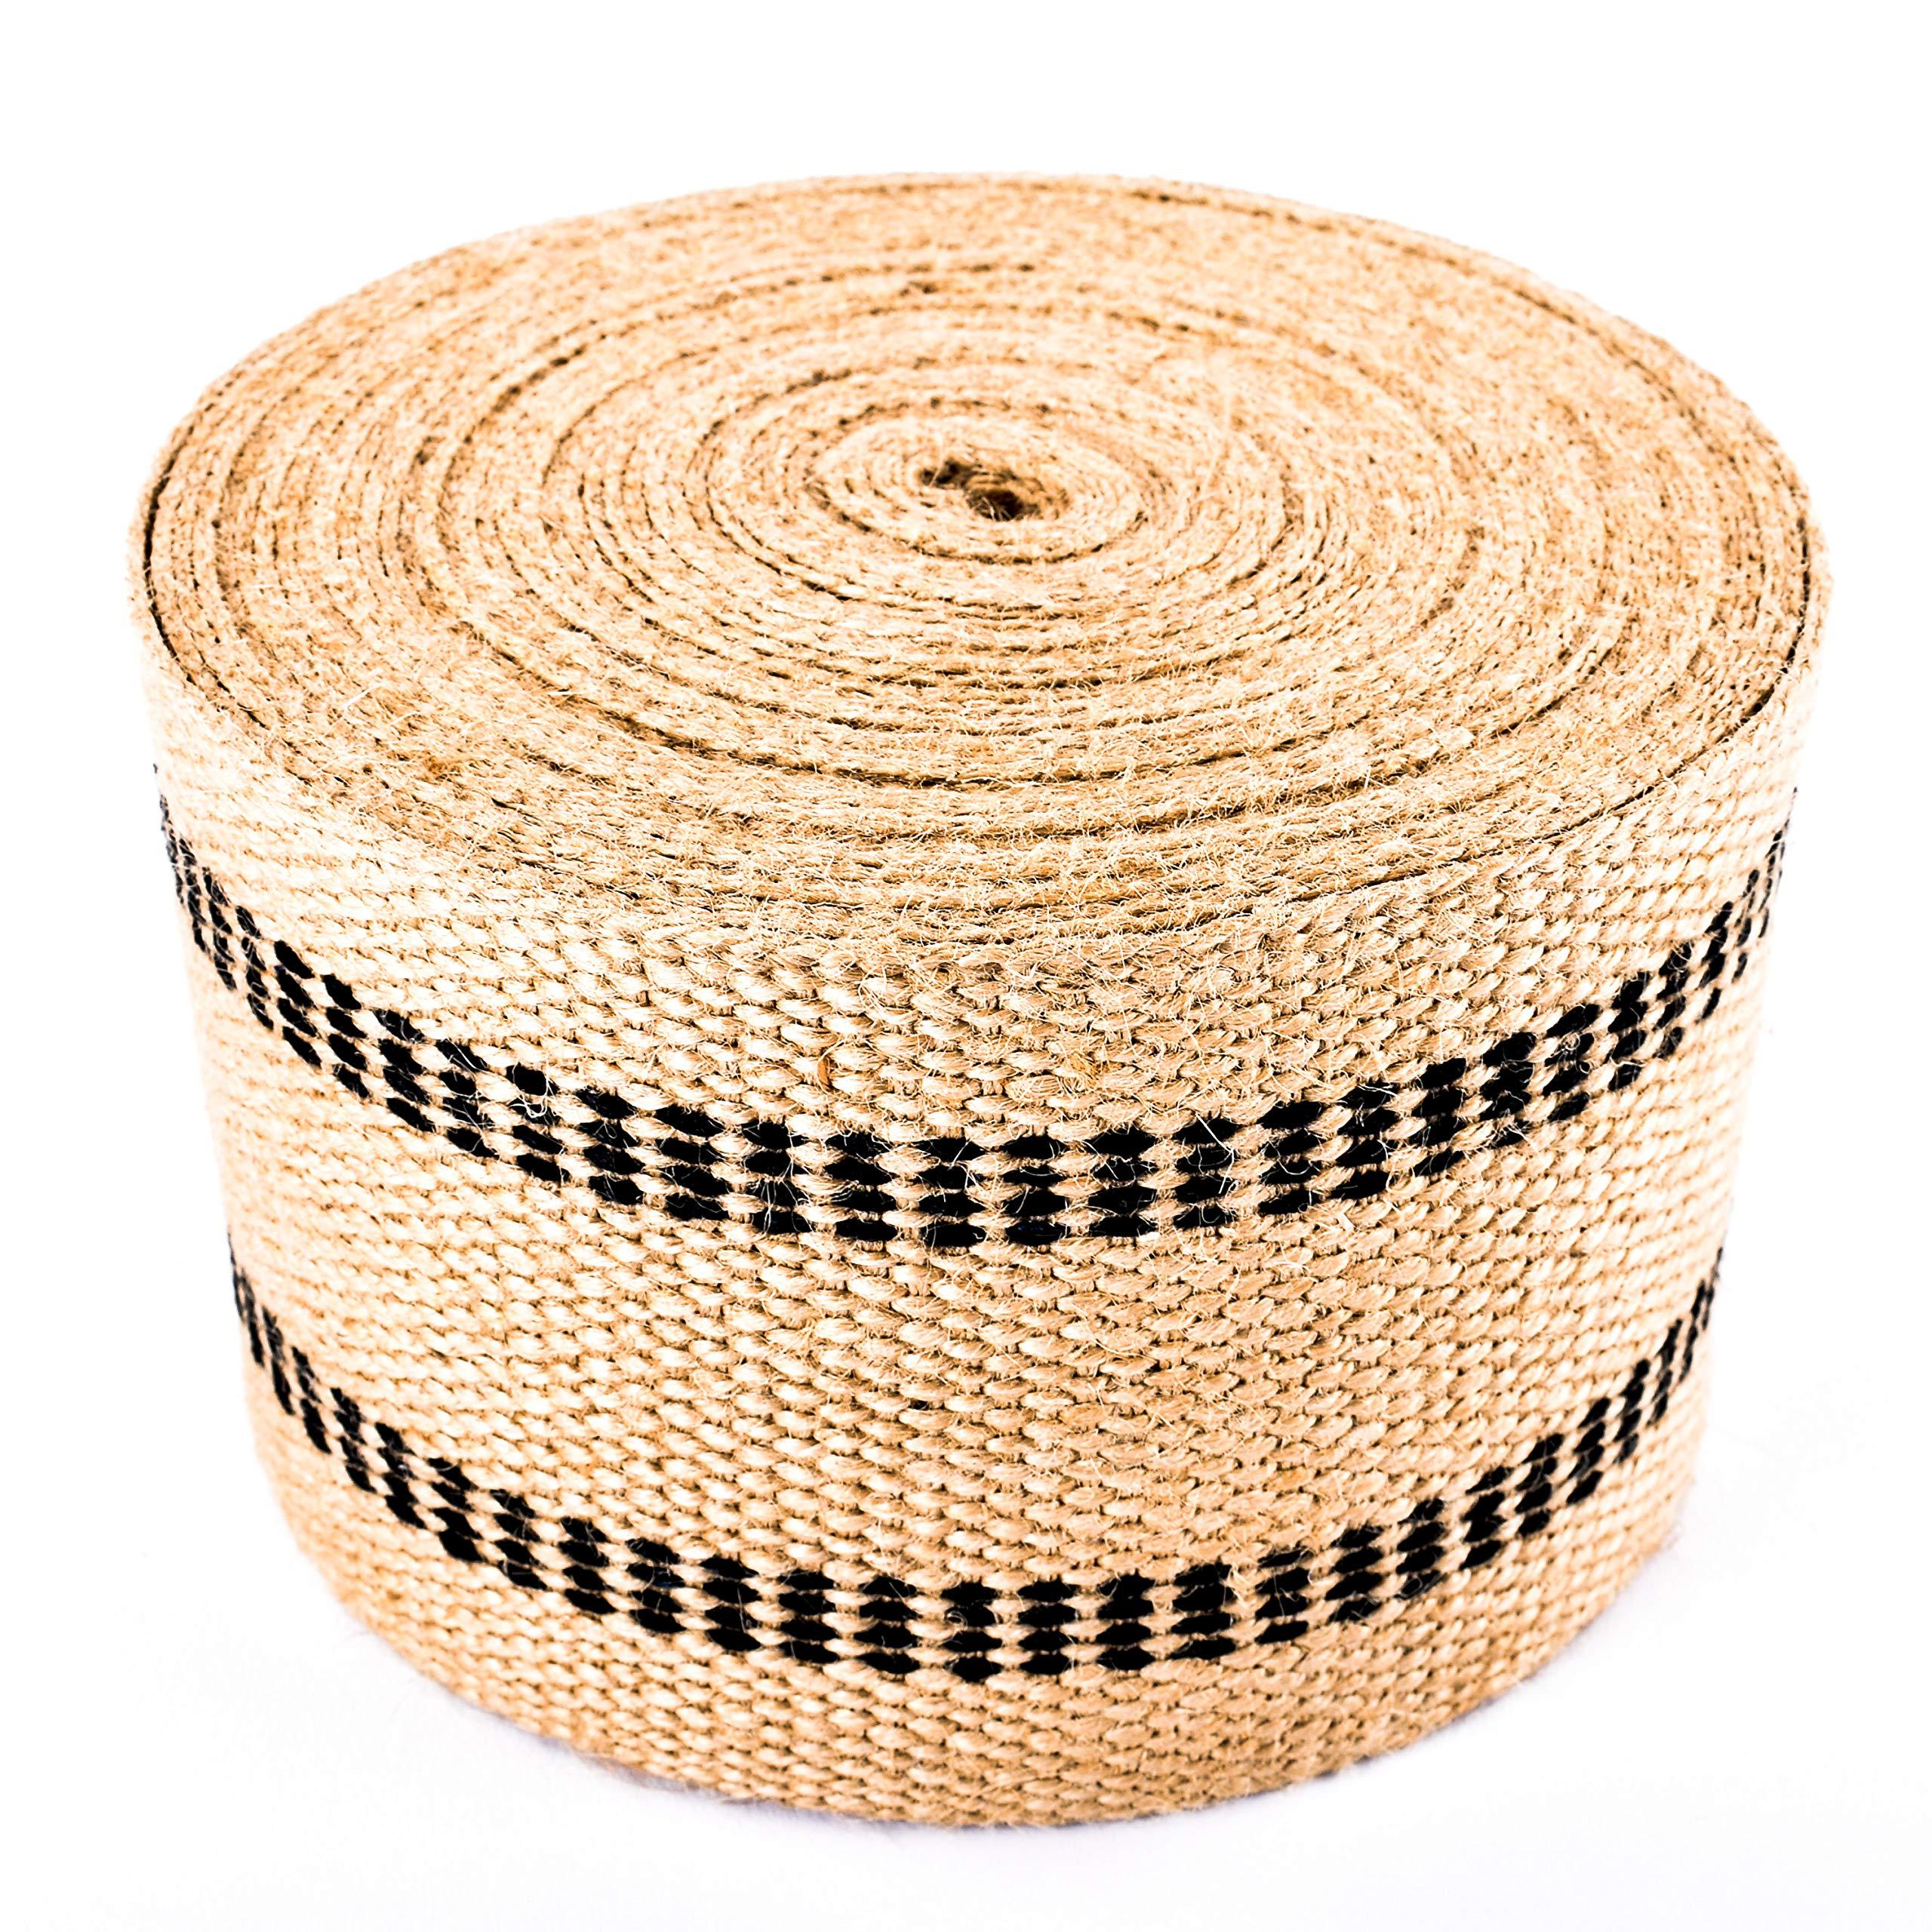 2 x 30 Mybecca 36 Inch Wide 10 Yards Quilt Batting Multipurpose Dacron Fiber Polyester Wadding Fabric 1//2 Loft Upholstery Grade Padding 36 x 360